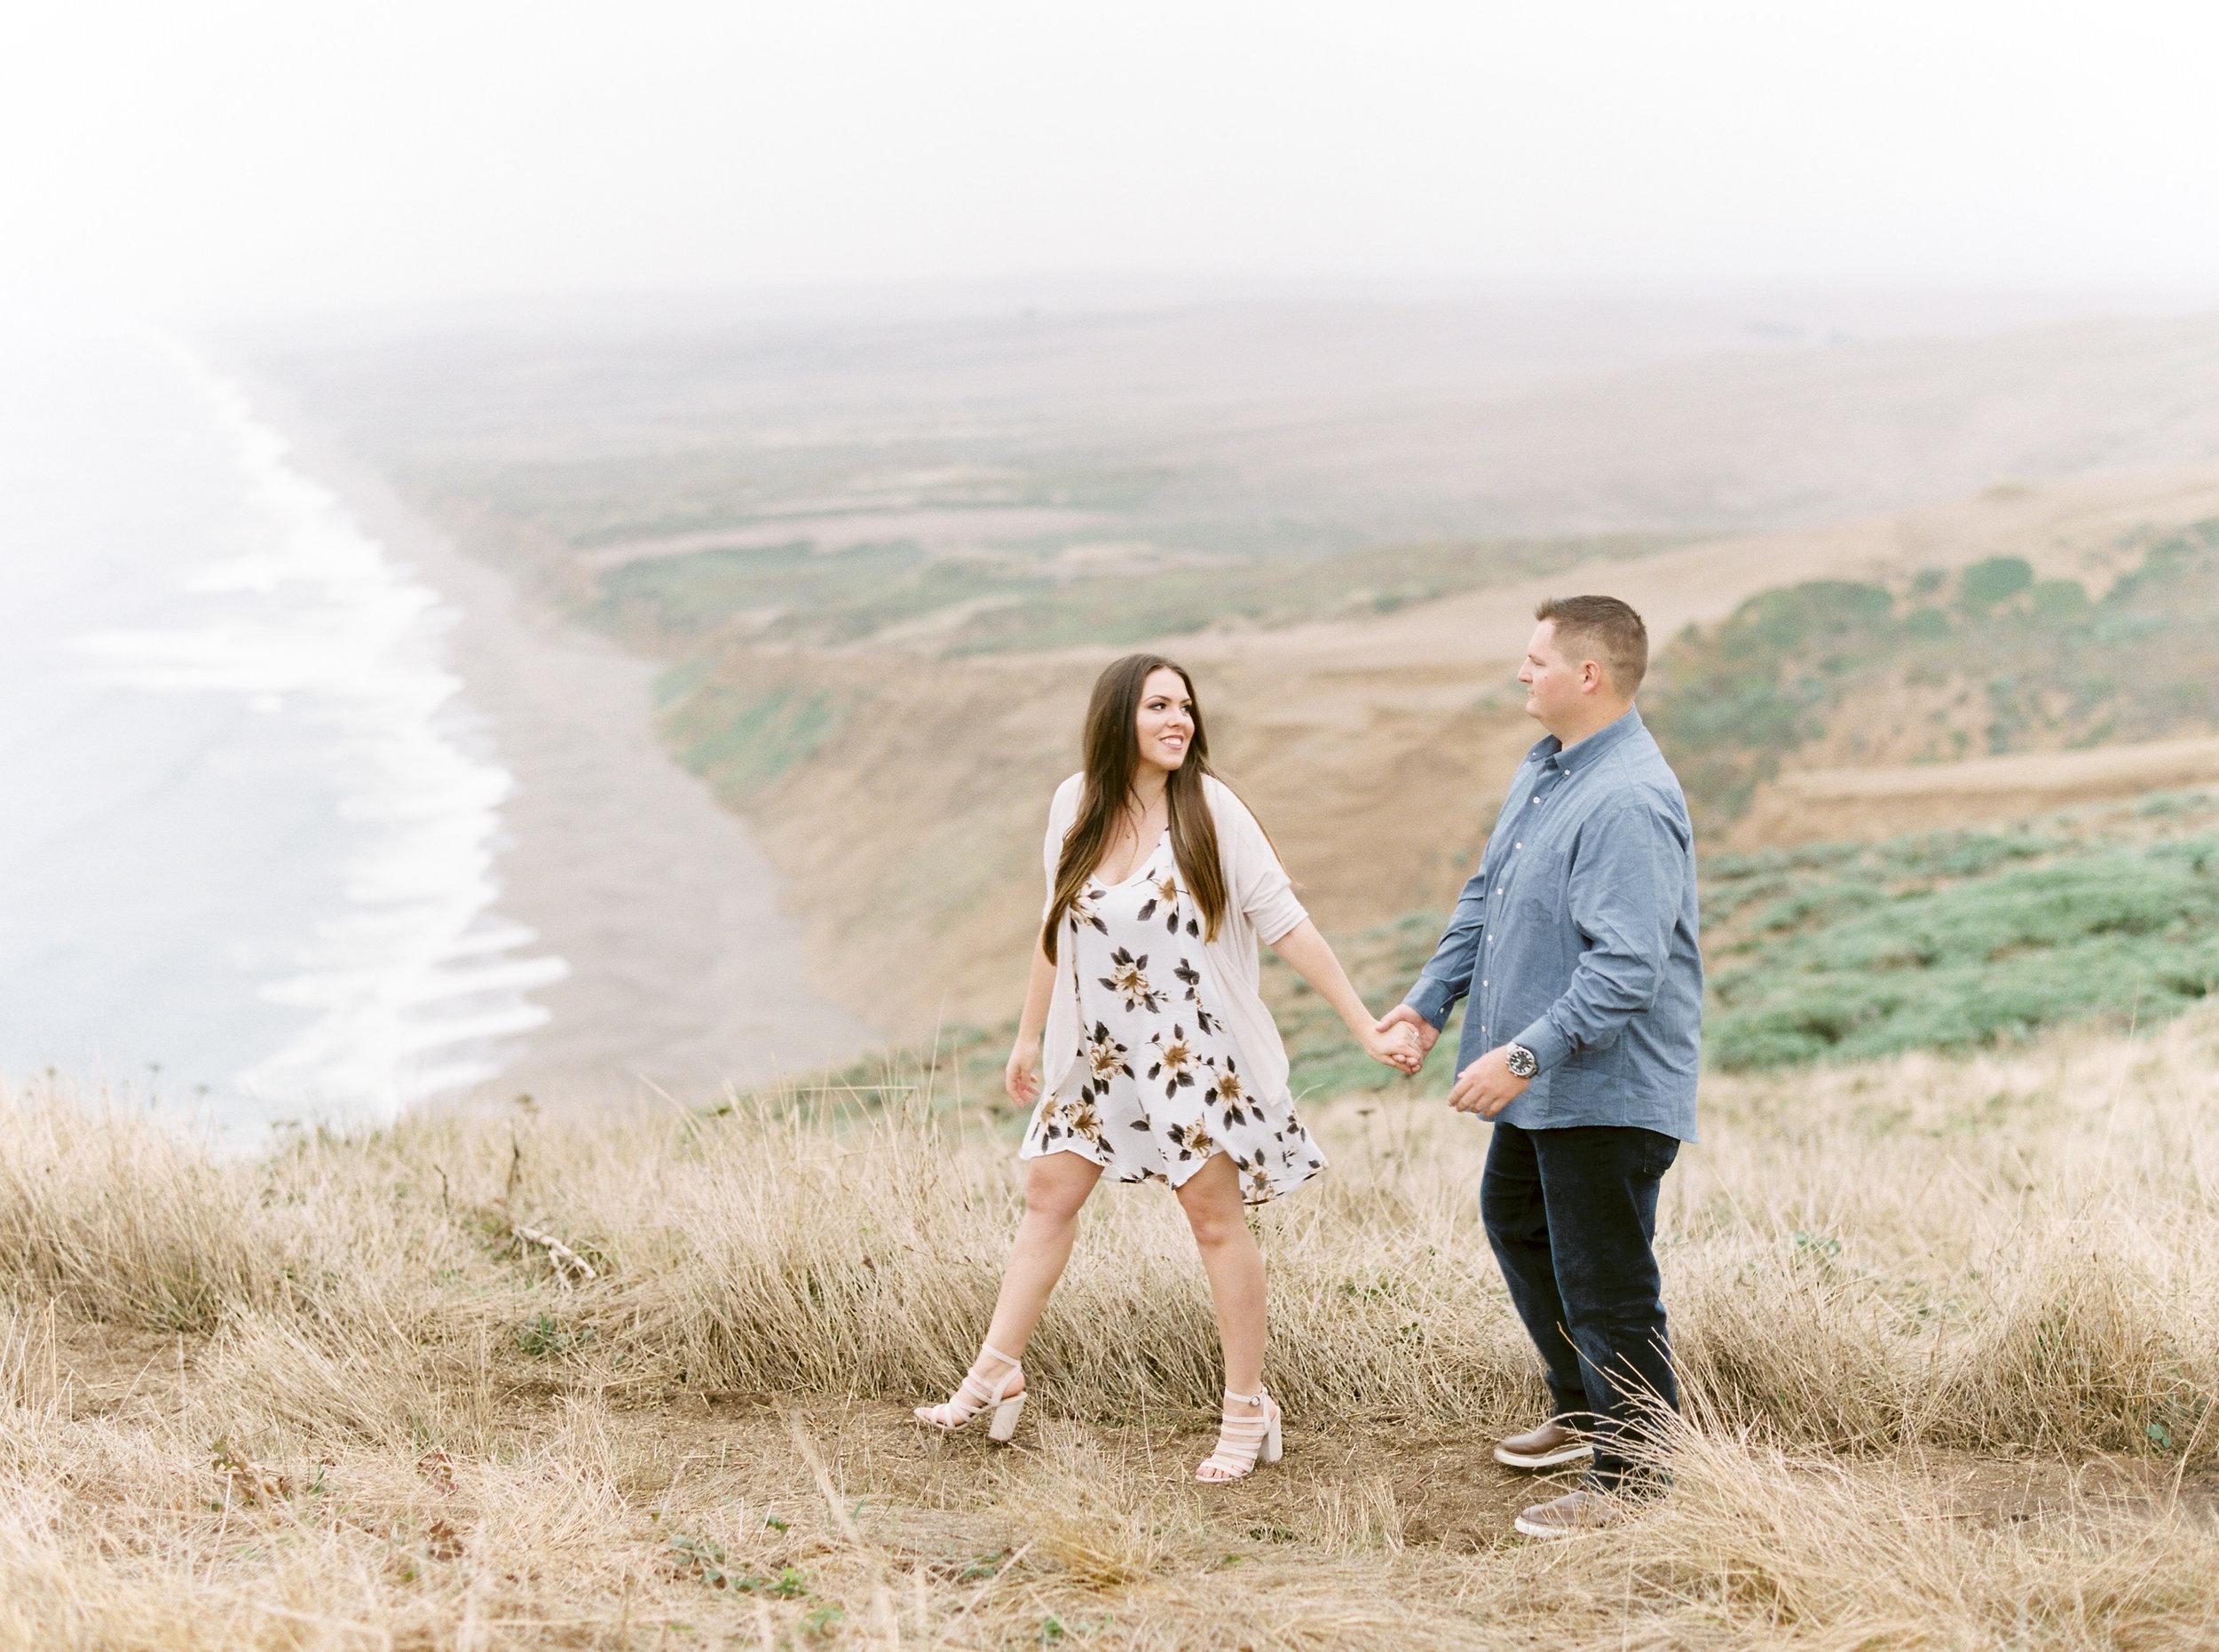 Point-reyes-california-engagement-photographer-18.jpg